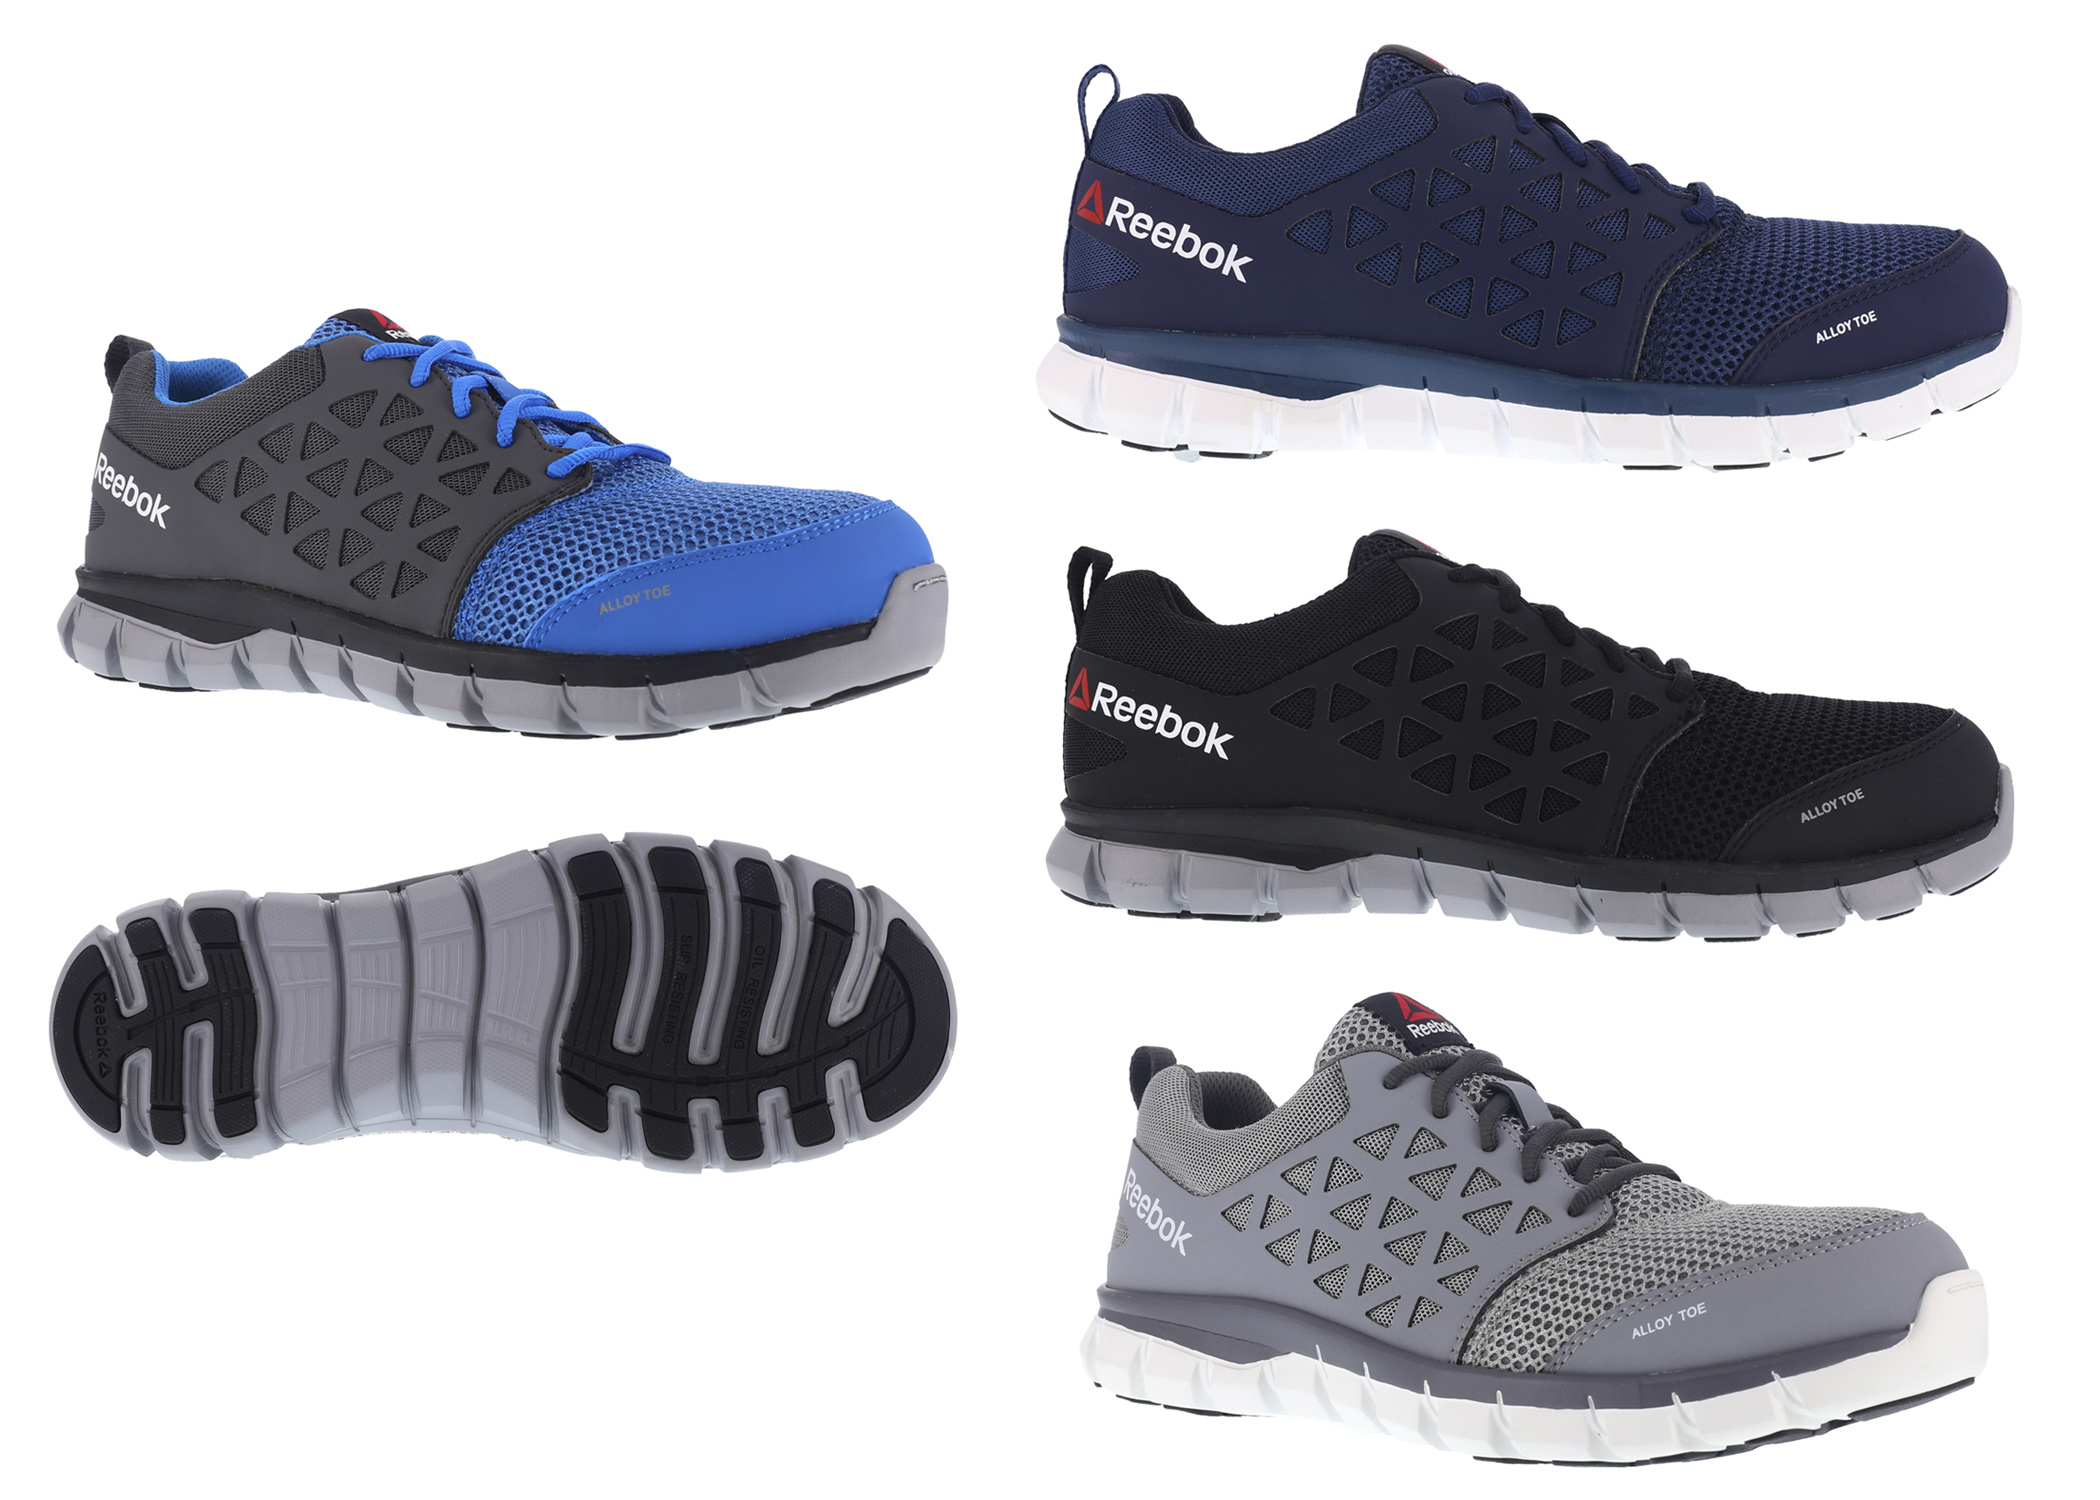 681ed8bee28909 New Reebok Sublite Cushion Work brings lightweight cushioning to work  footwear